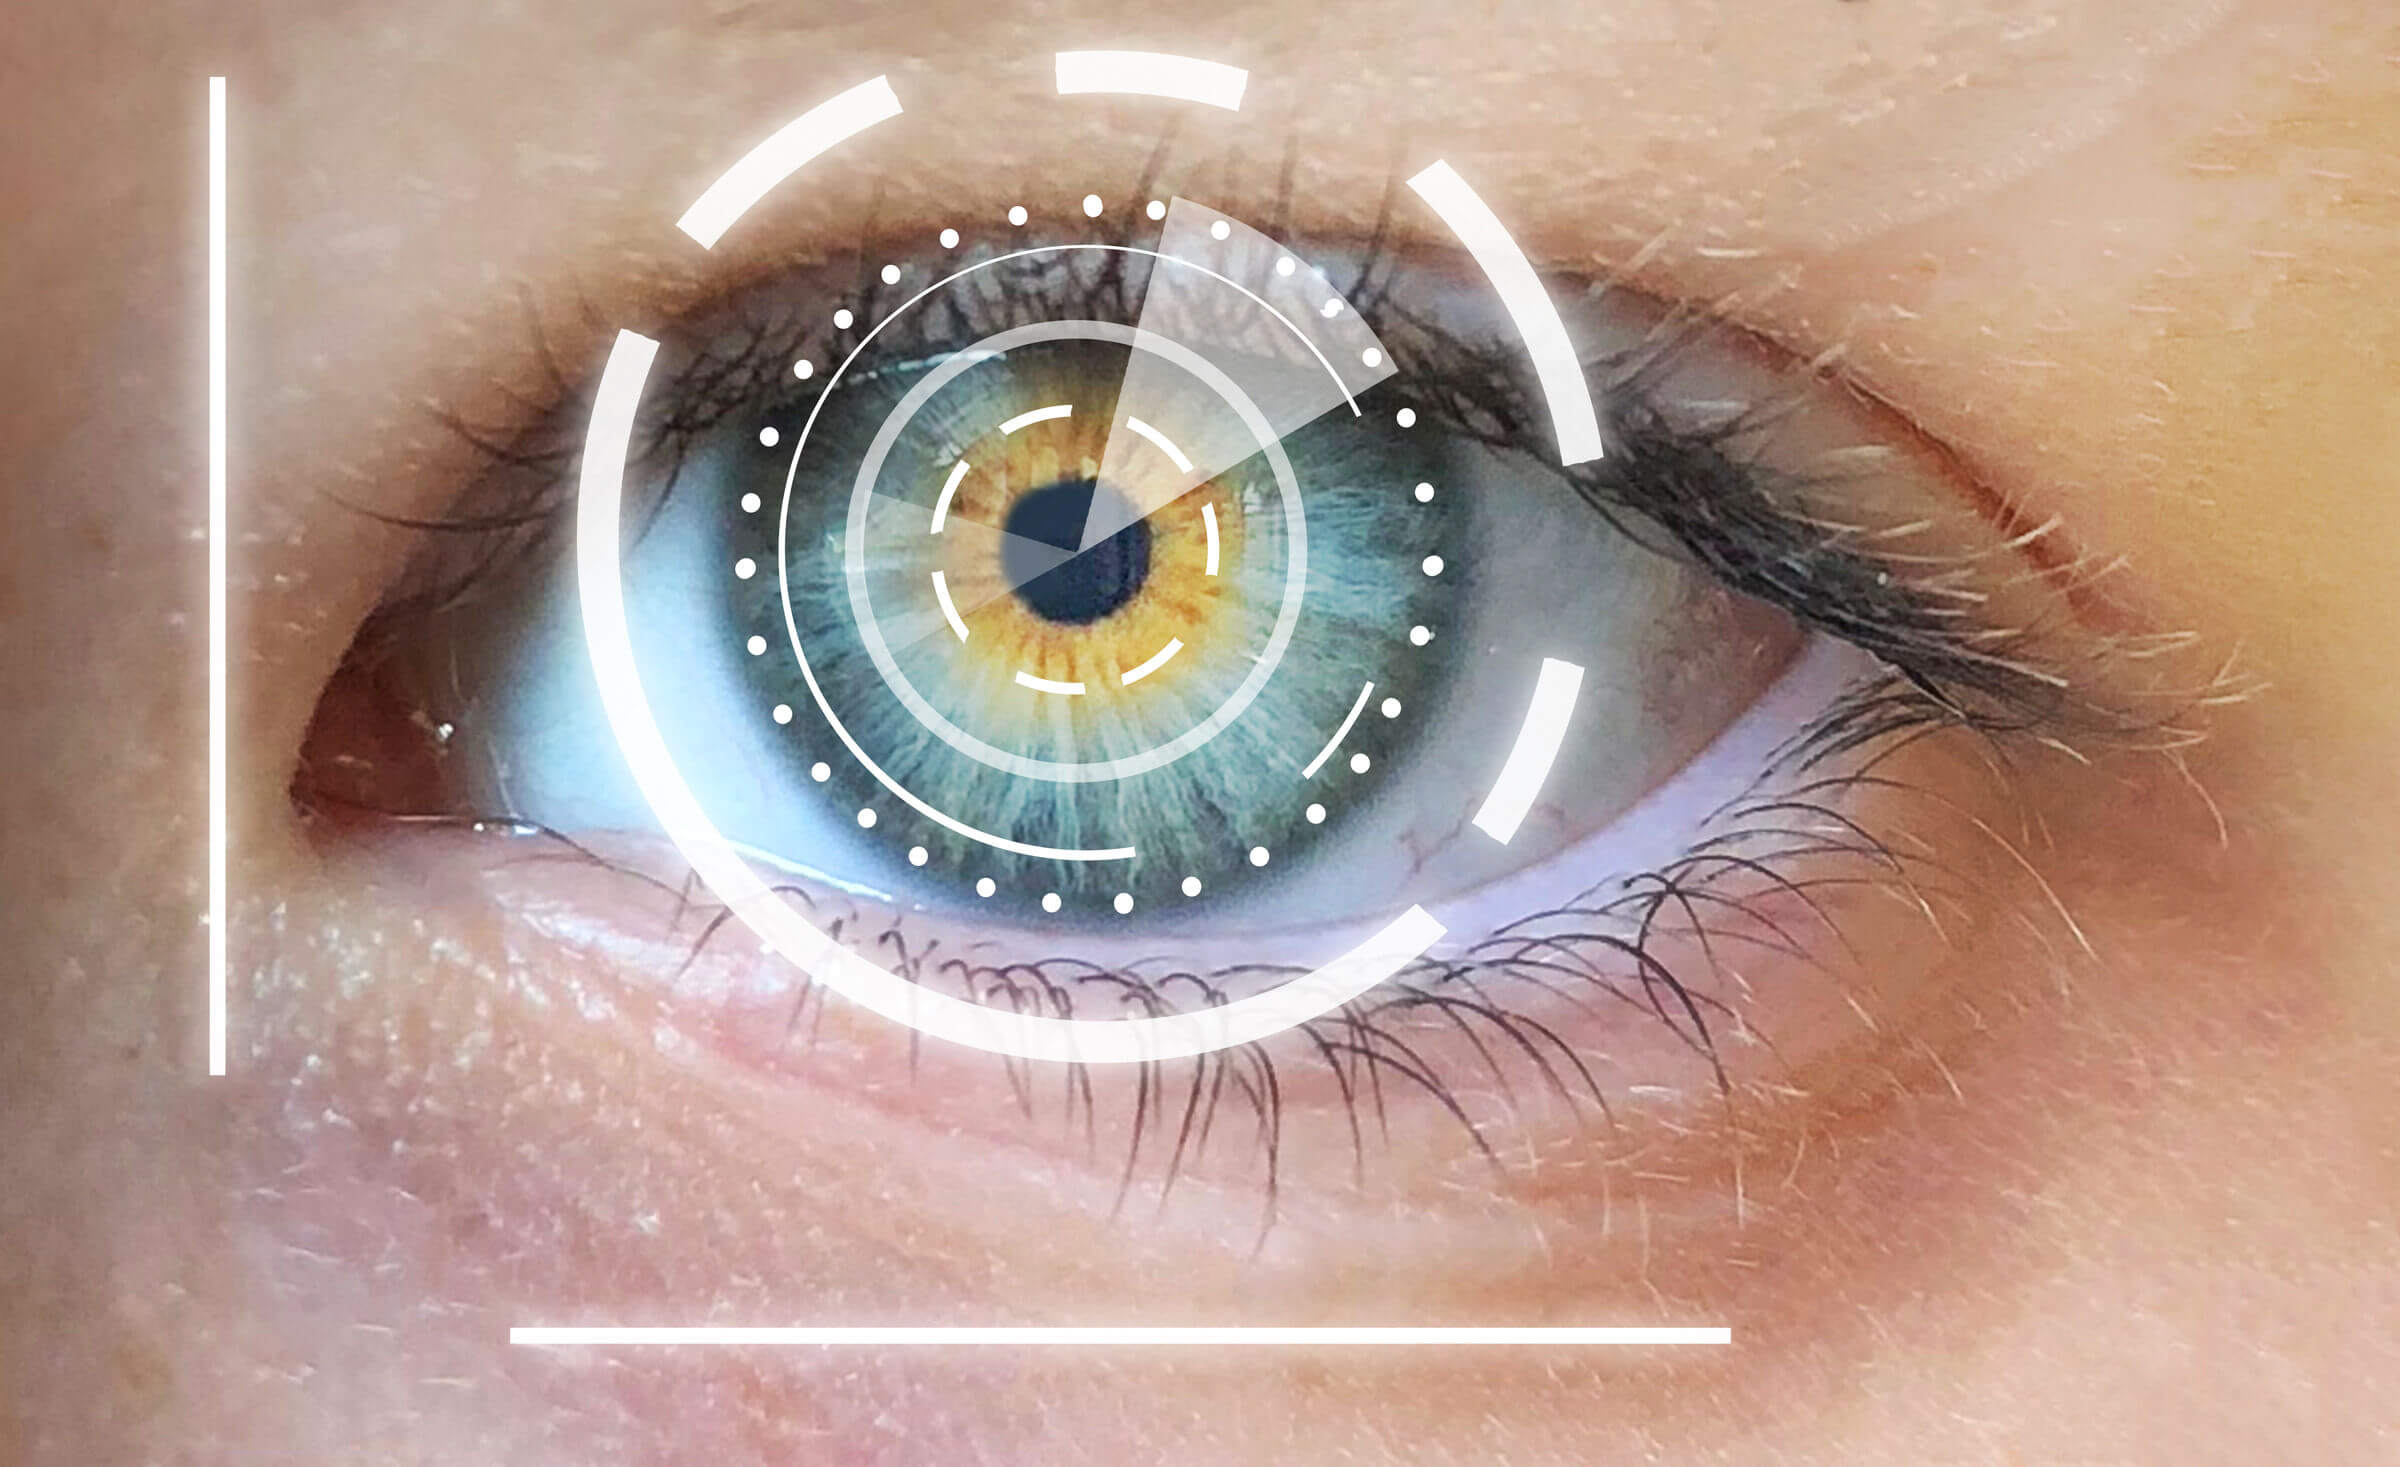 retina görsel 2.jpg